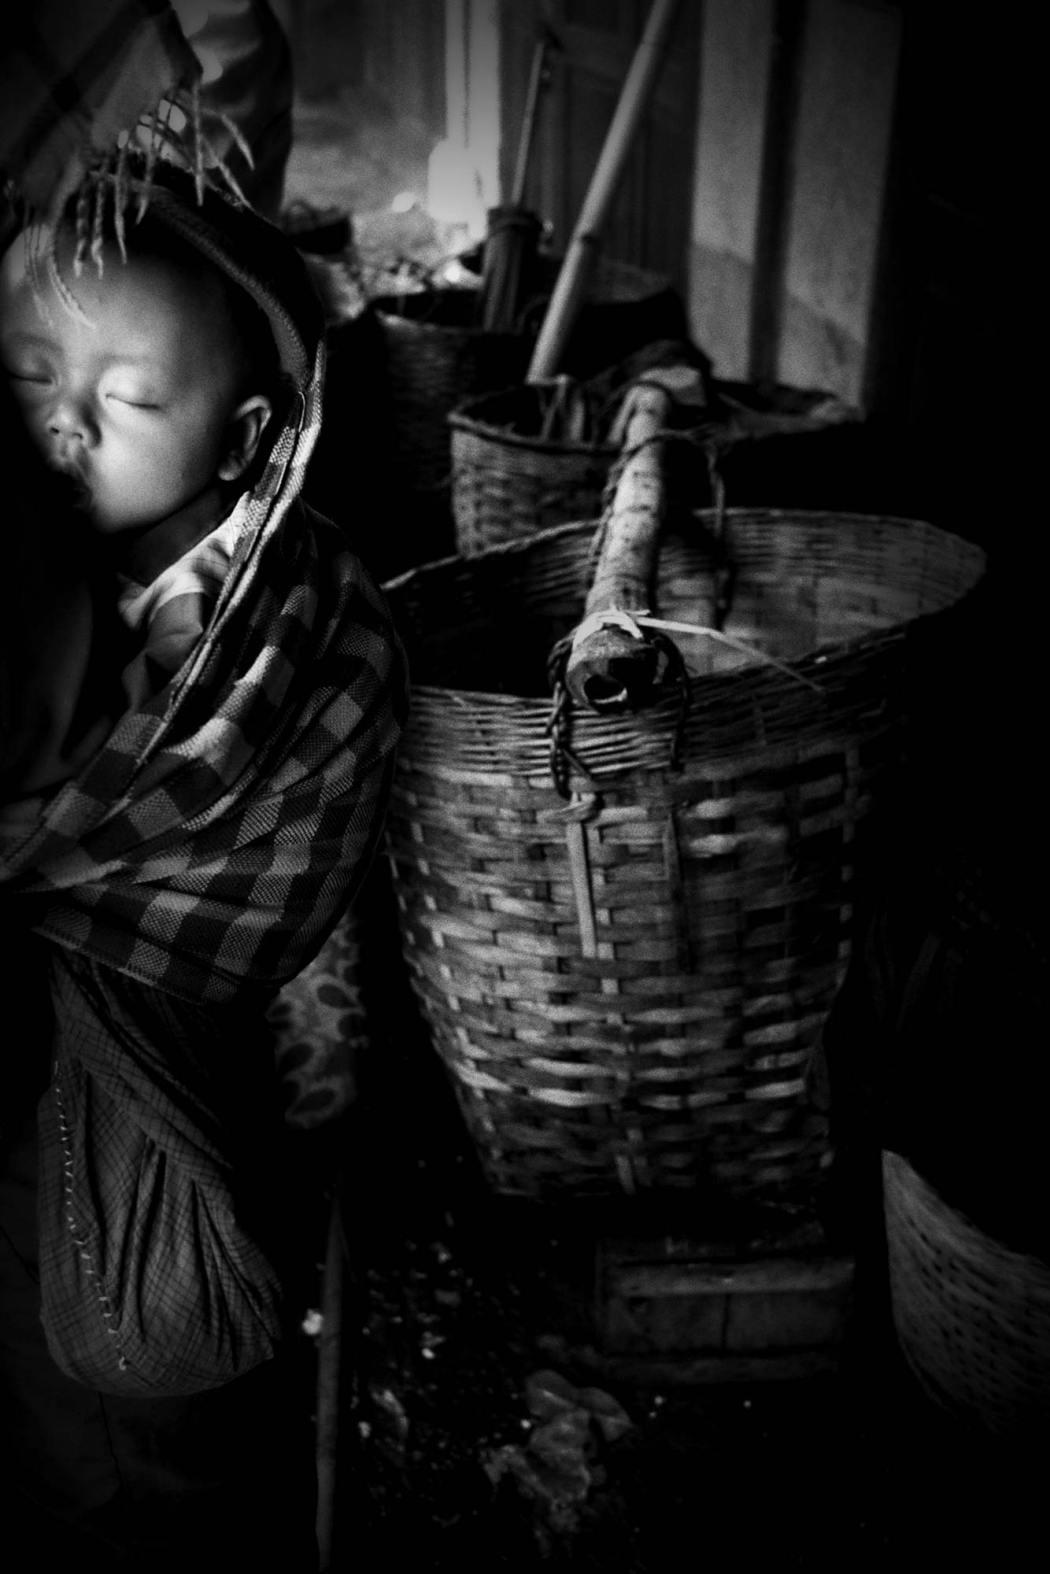 © Yasuhiro Ogawa, courtesy of Blue Lotus Gallery, 'untitled', Kalaw, Myanmar, 1994, [The Dreaming, pg 005]